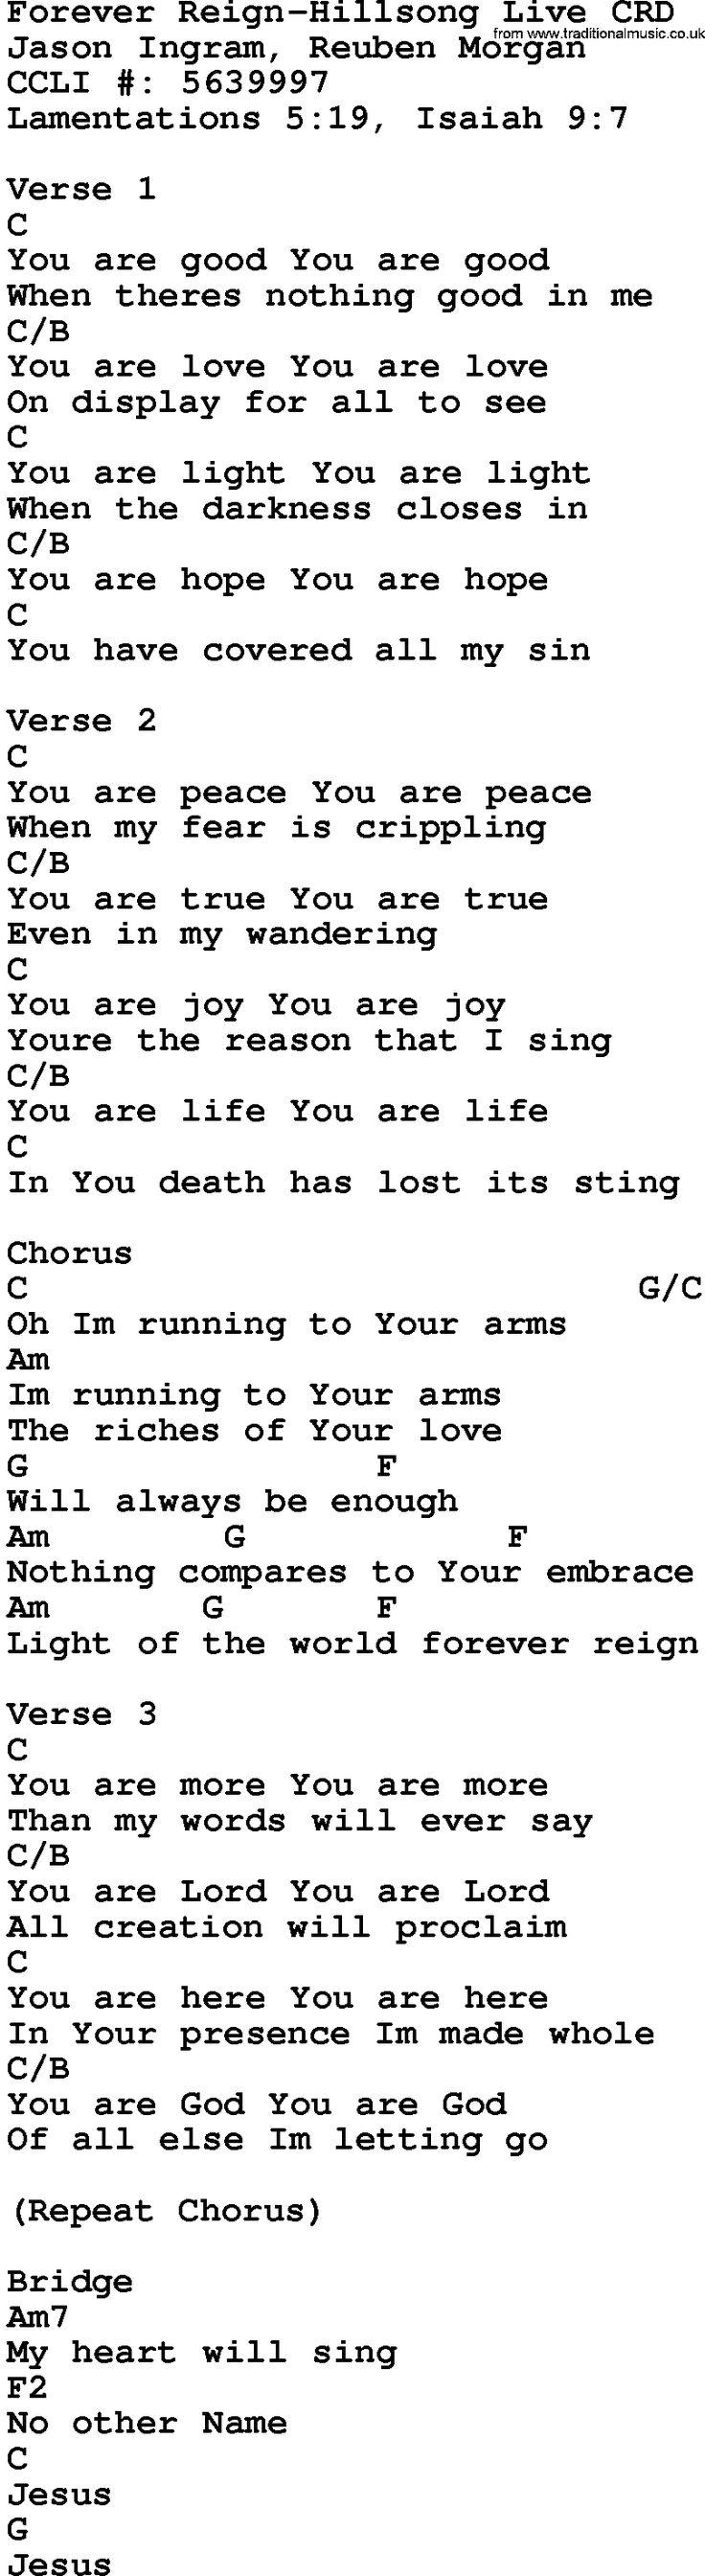 Killing Joke - Adorations Lyrics | MetroLyrics